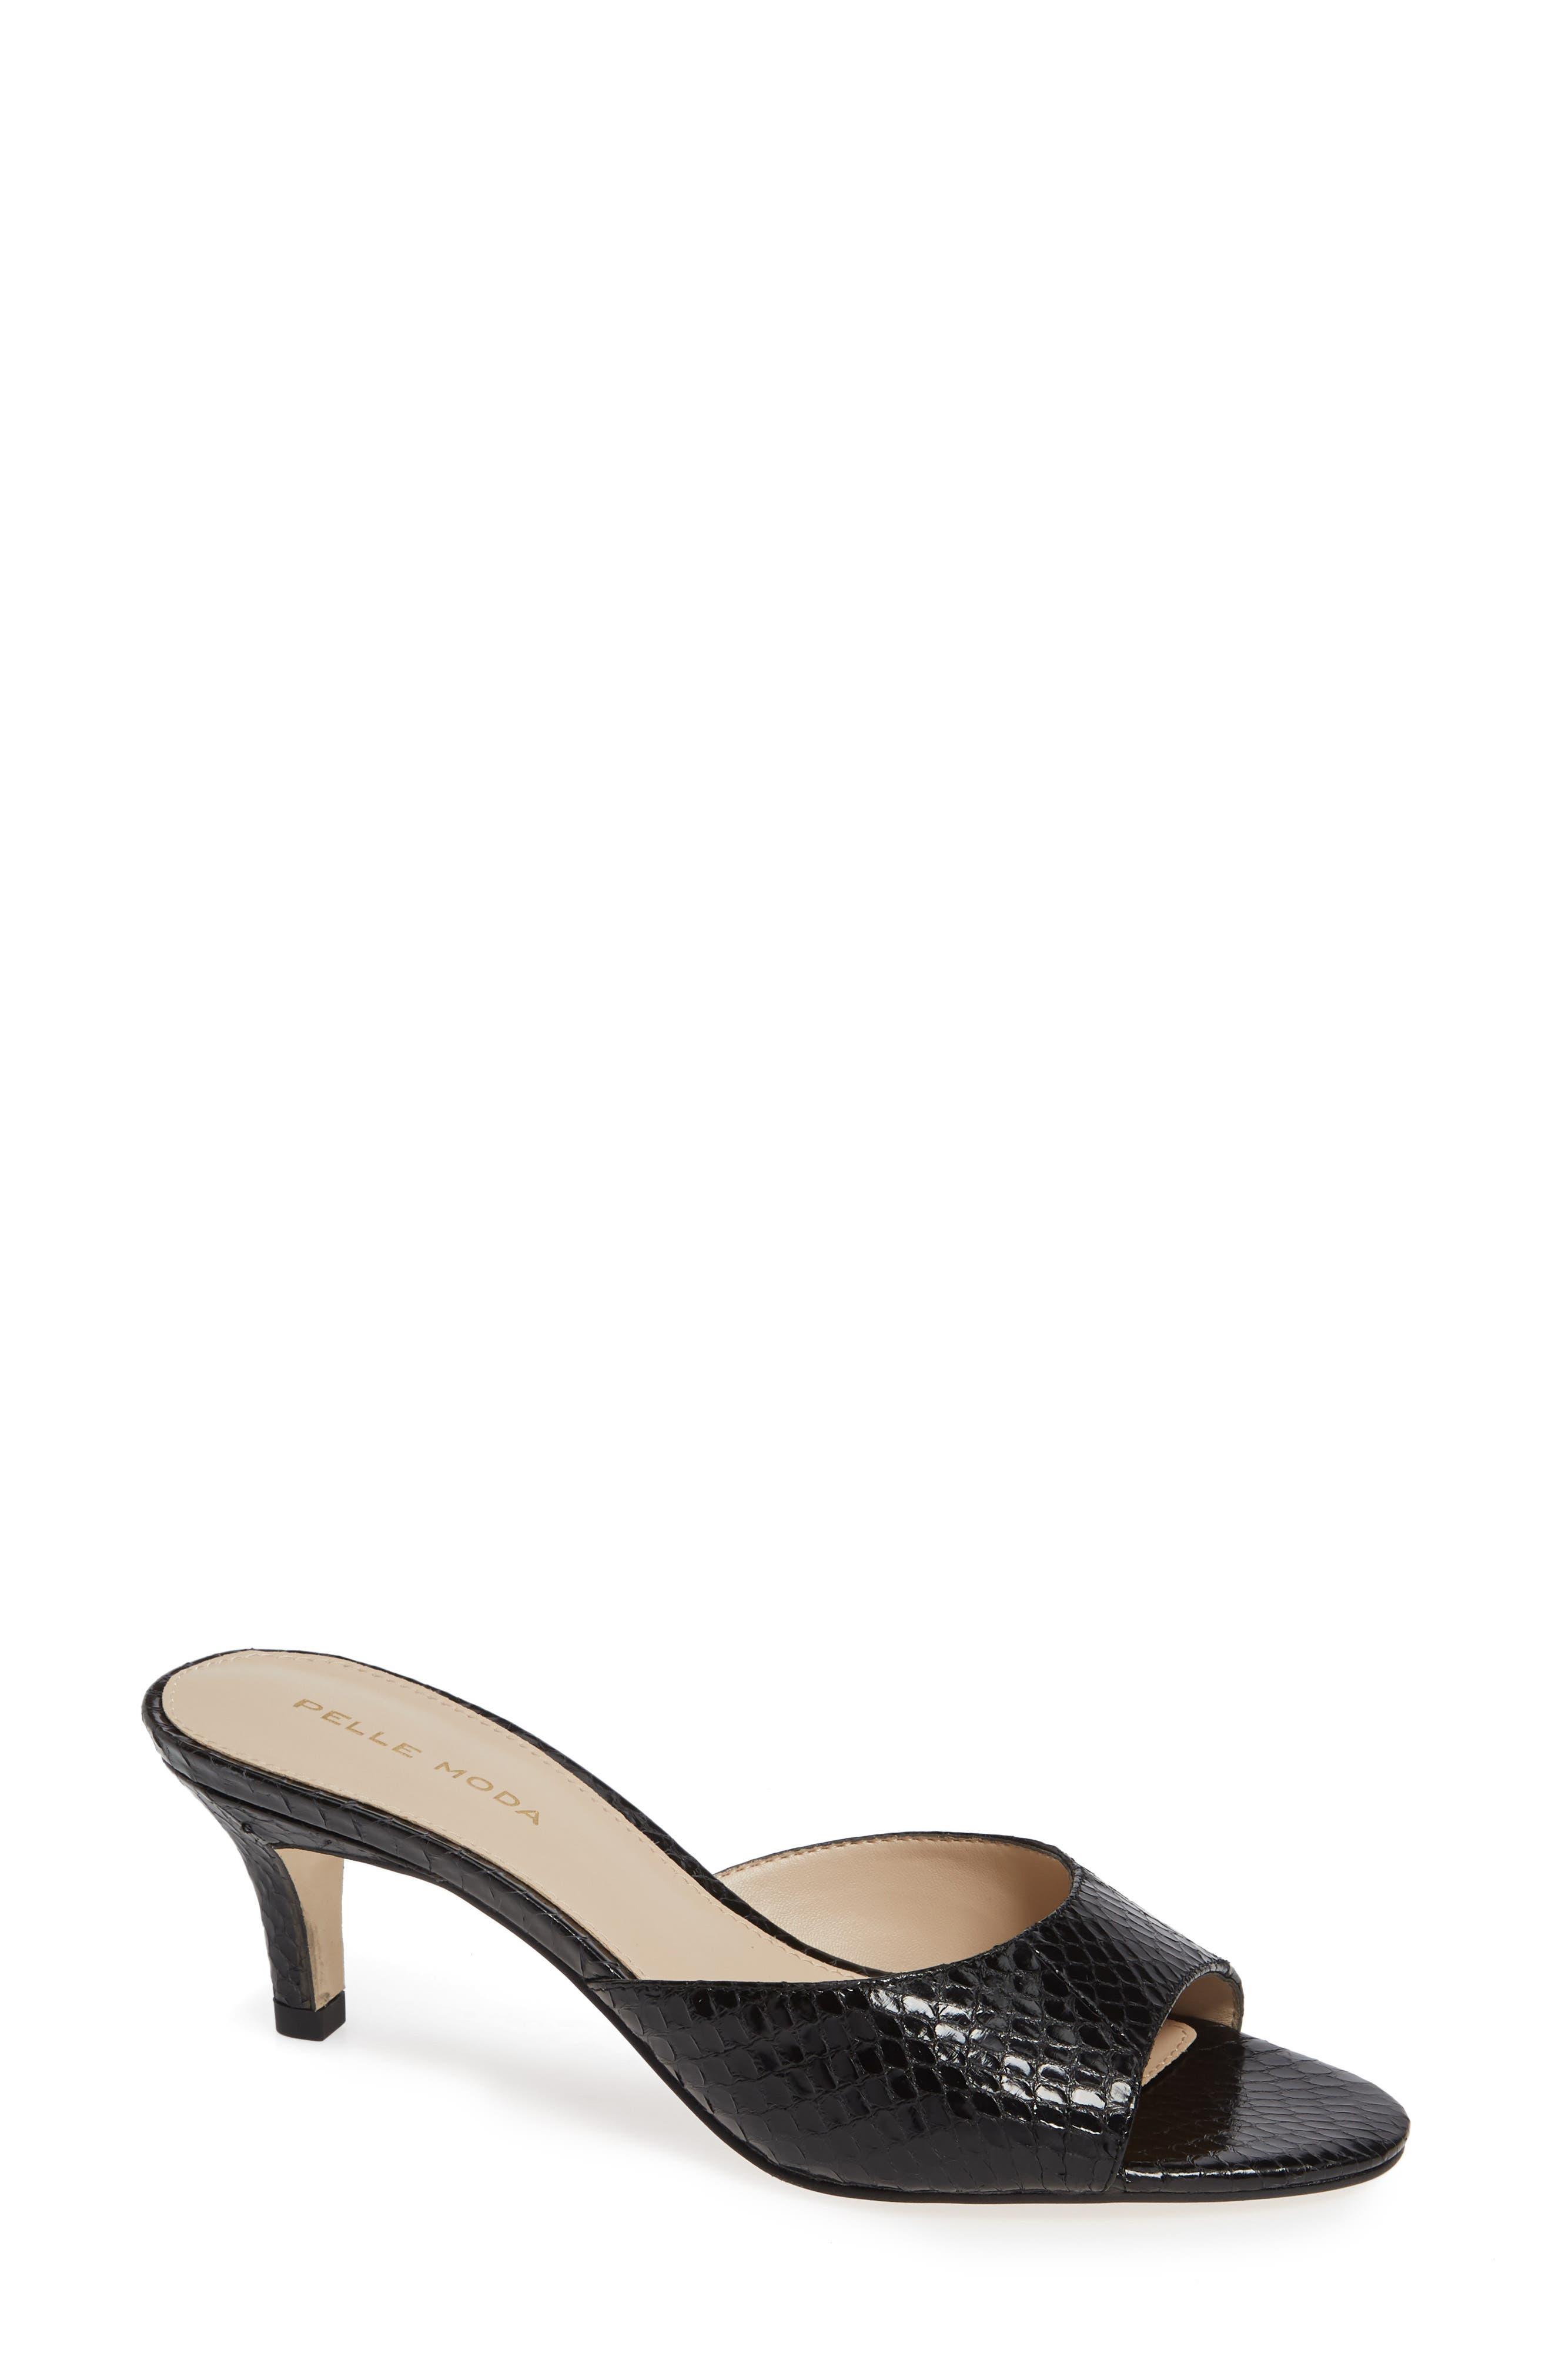 Bex Kitten Heel Slide Sandal, Main, color, BLACK PRINT LEATHER